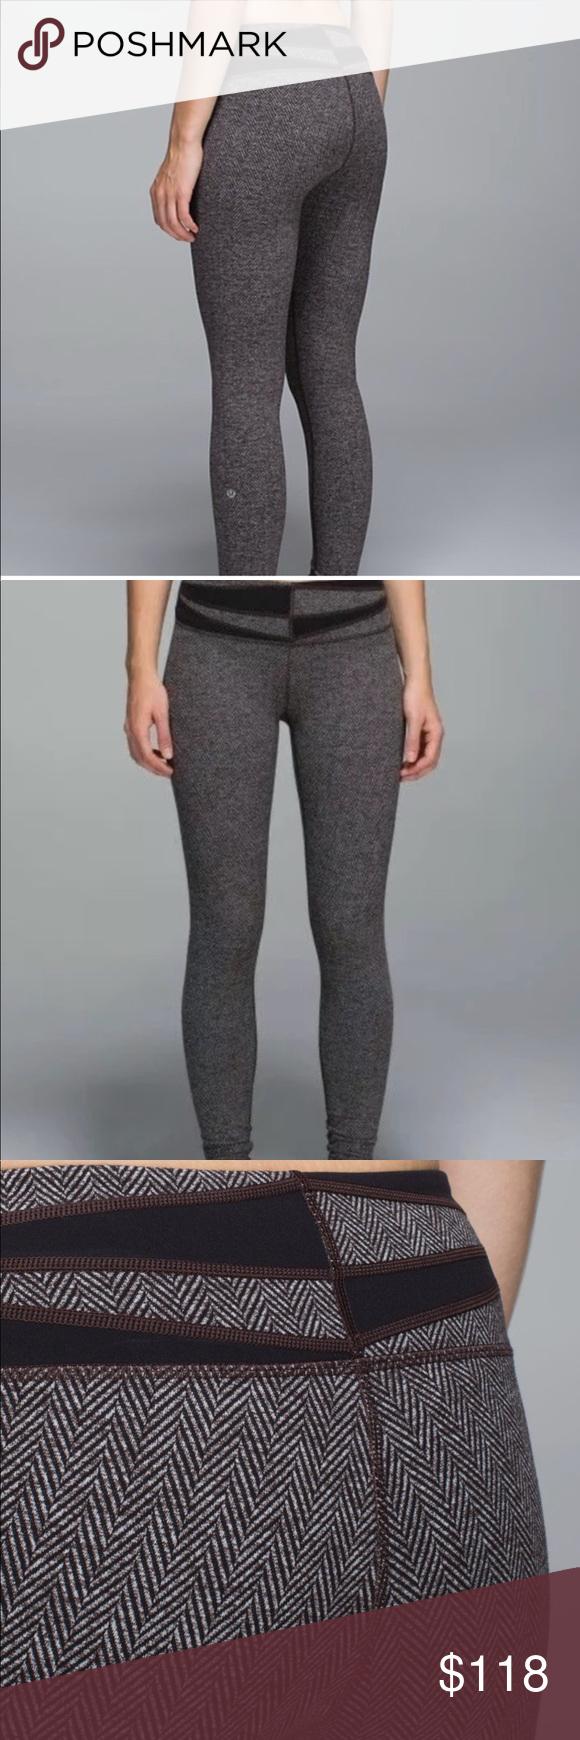 de9e627ce8 Like new brown lululemon herringbone leggings cottony-soft Luon fabric is  engineered for serious stretch